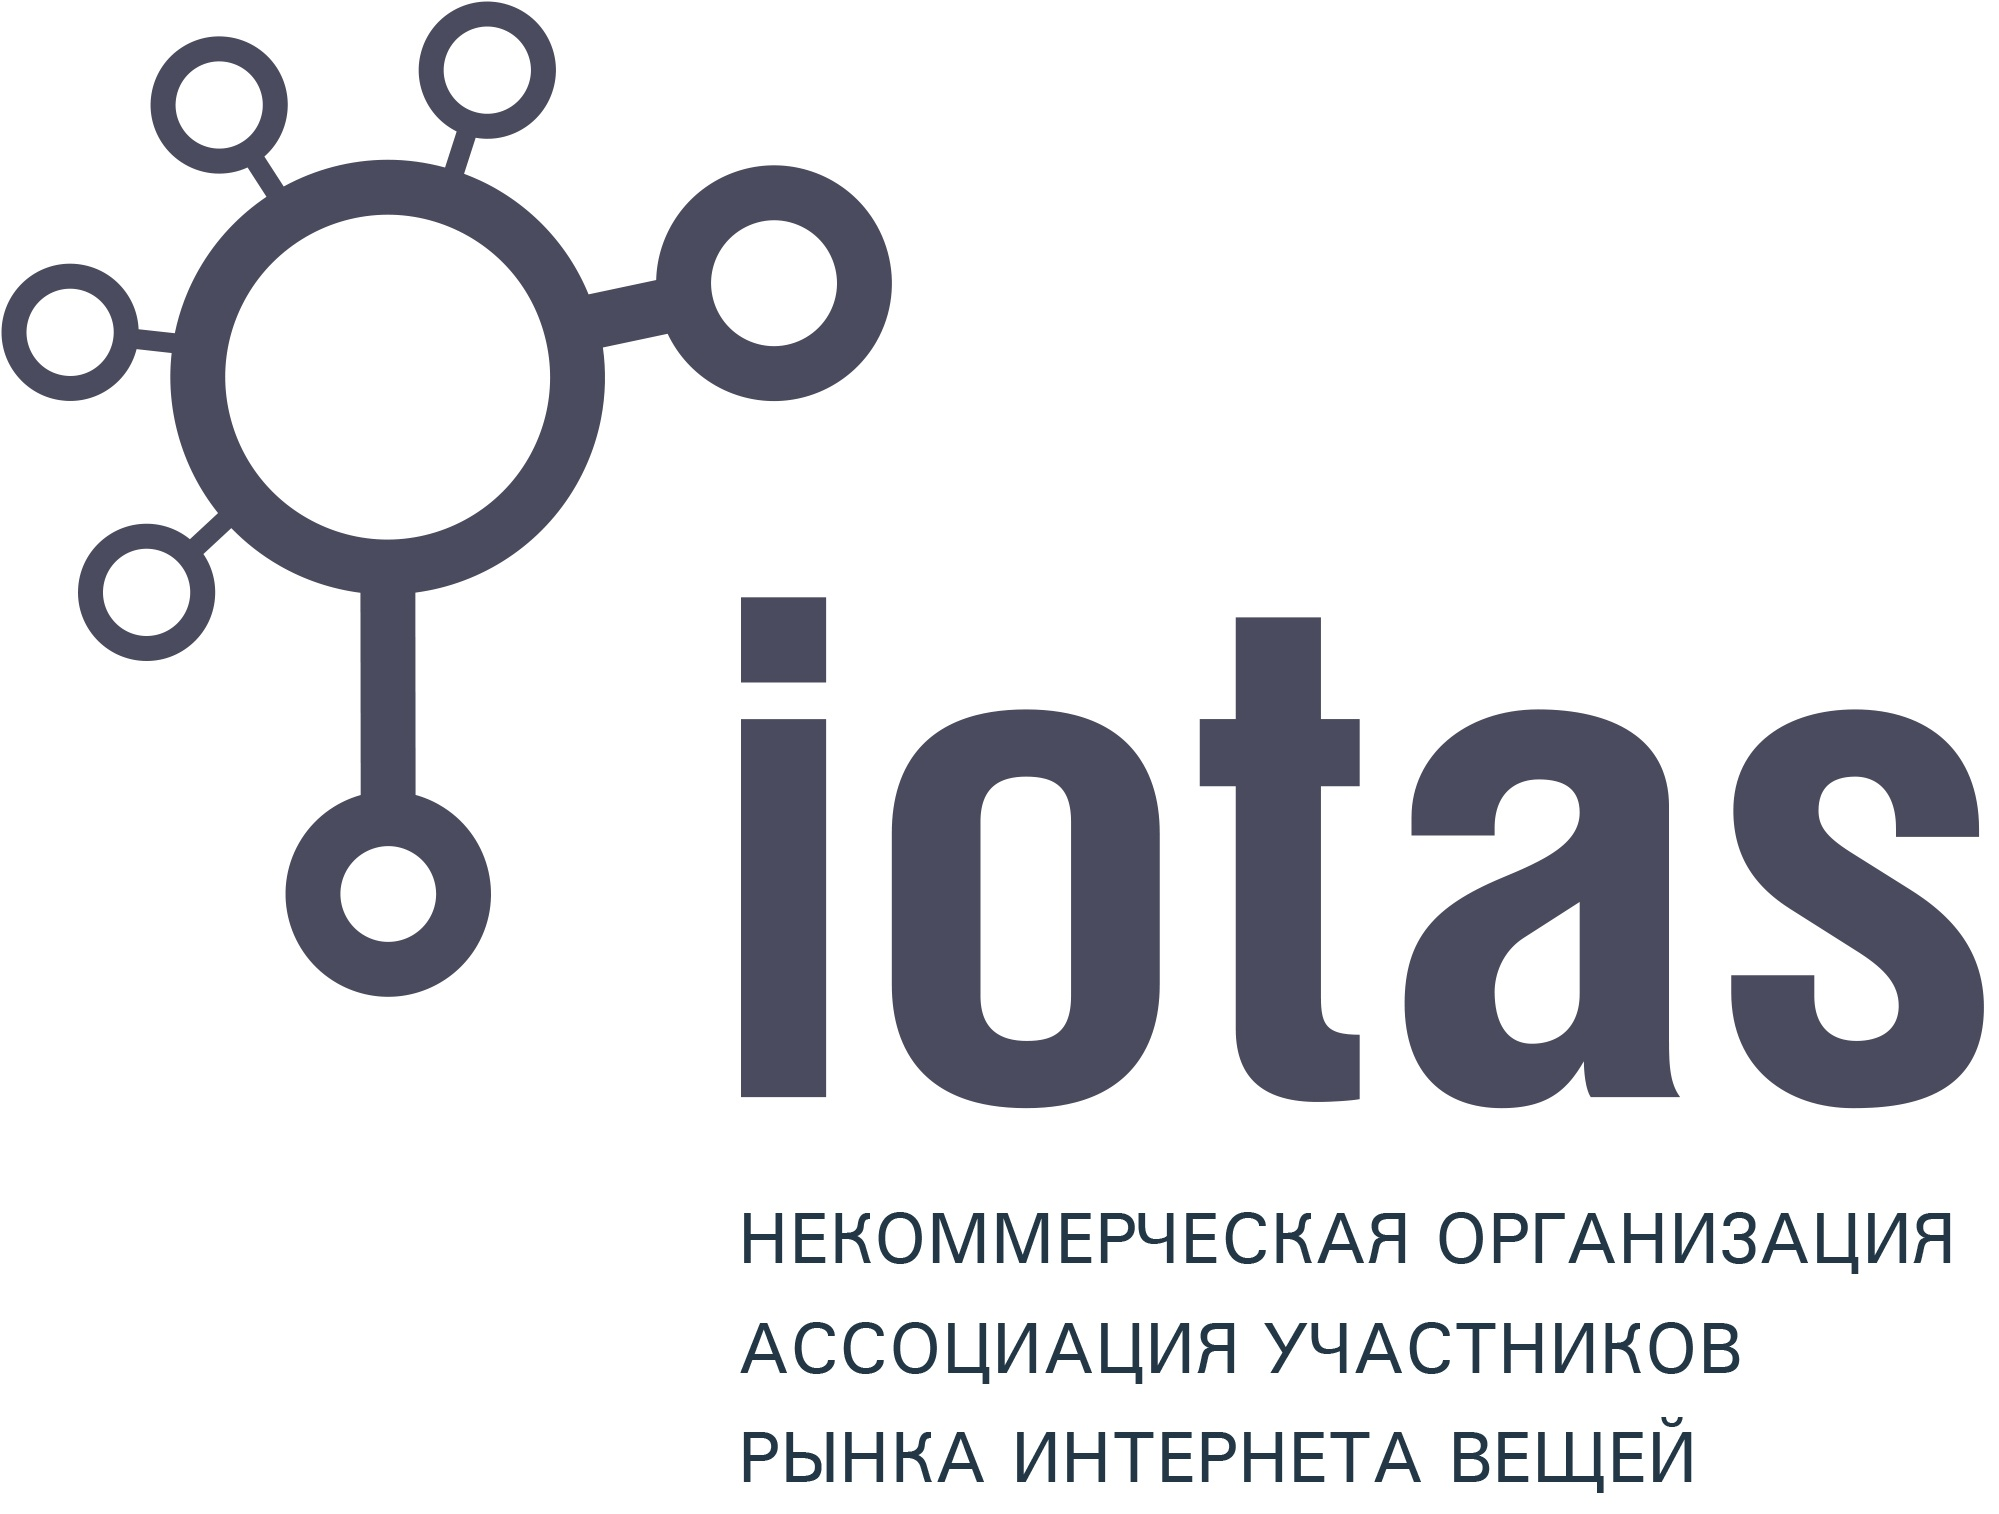 Iotas_logo_1_